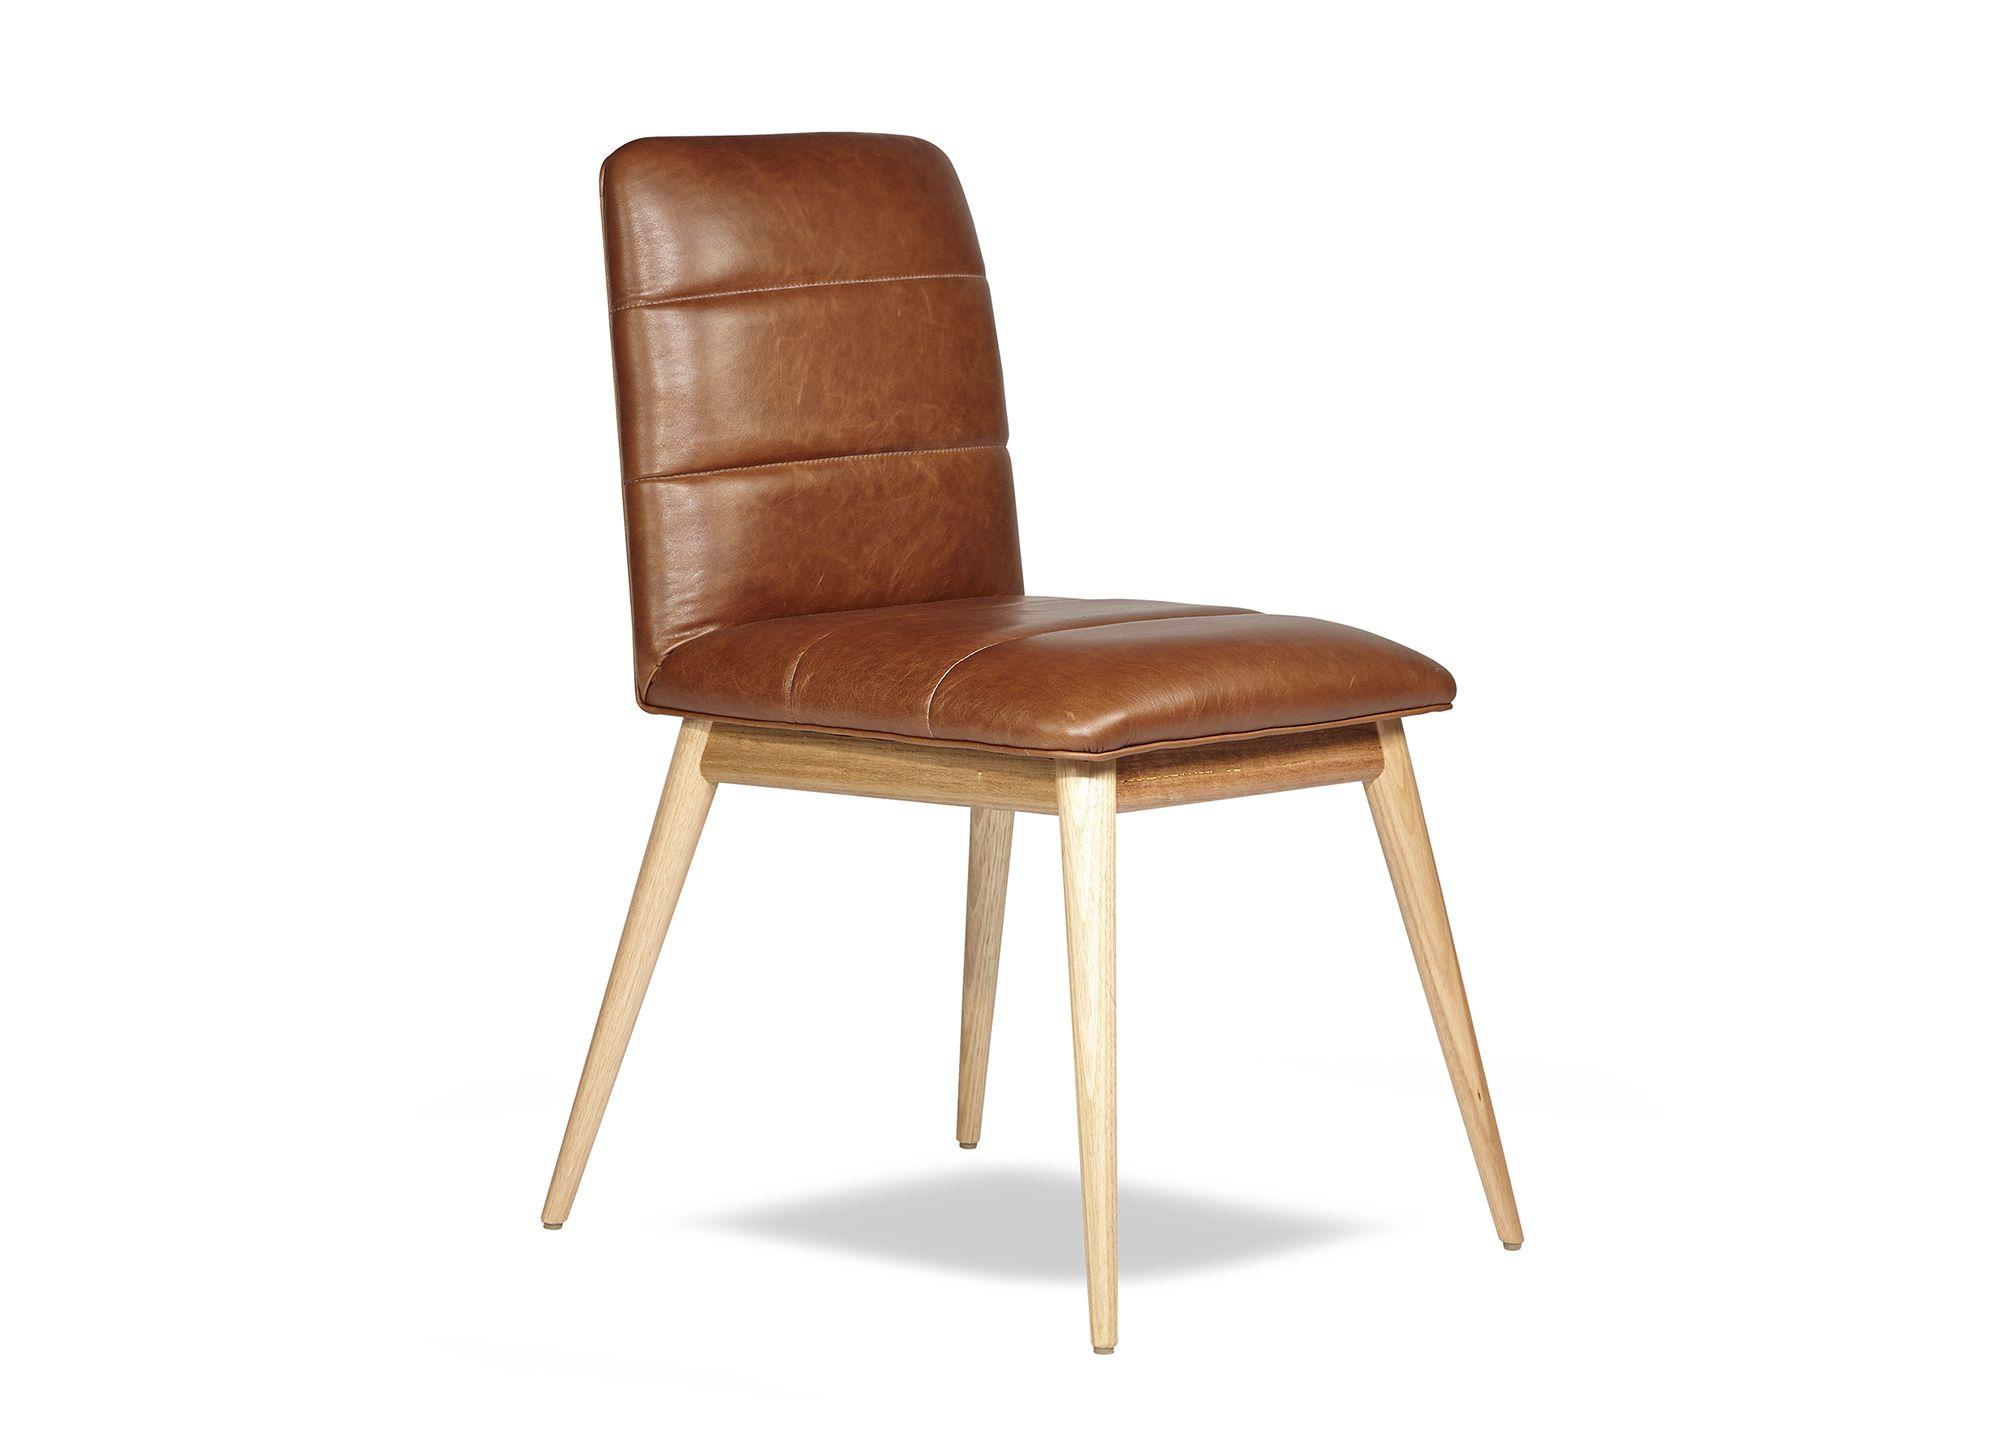 tan leather dining chairs melbourne d box chair arthur g reuben australian